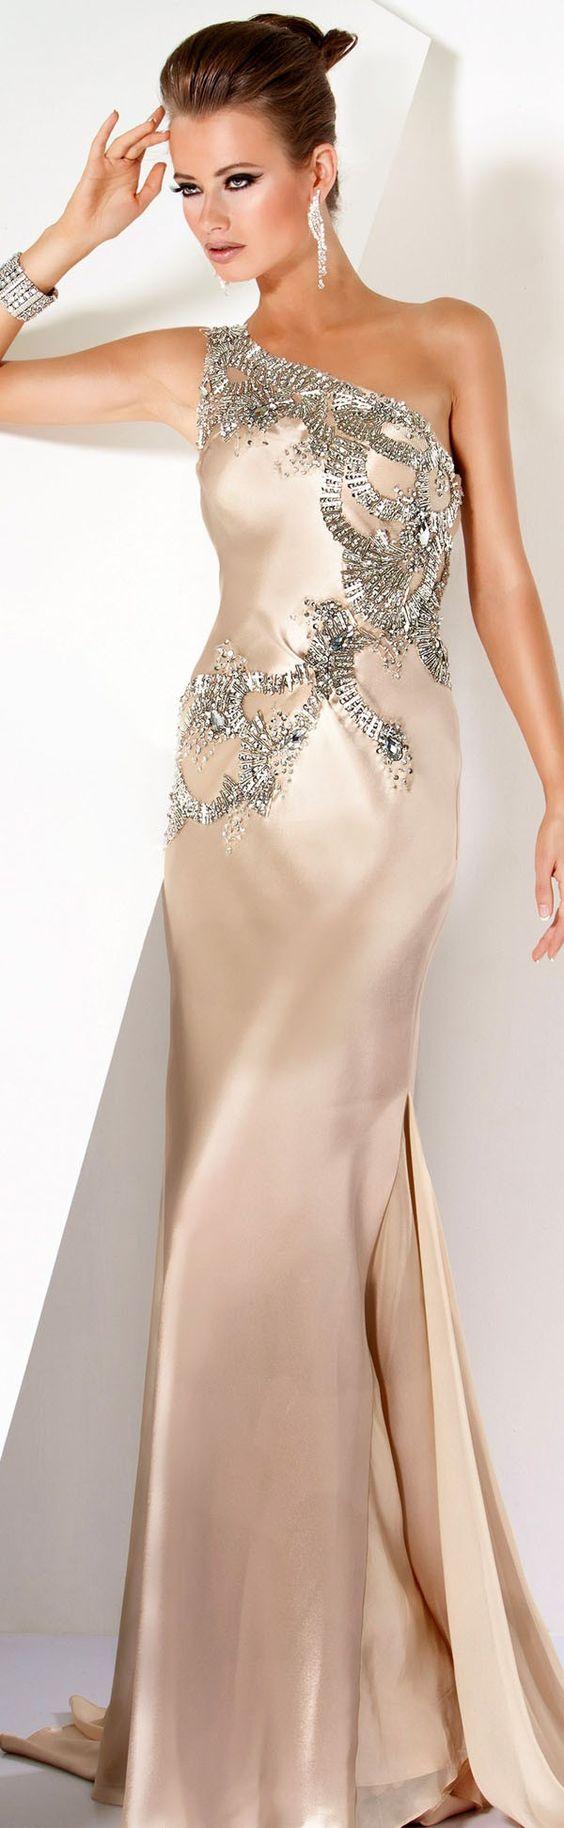 High Fashion Dress Style